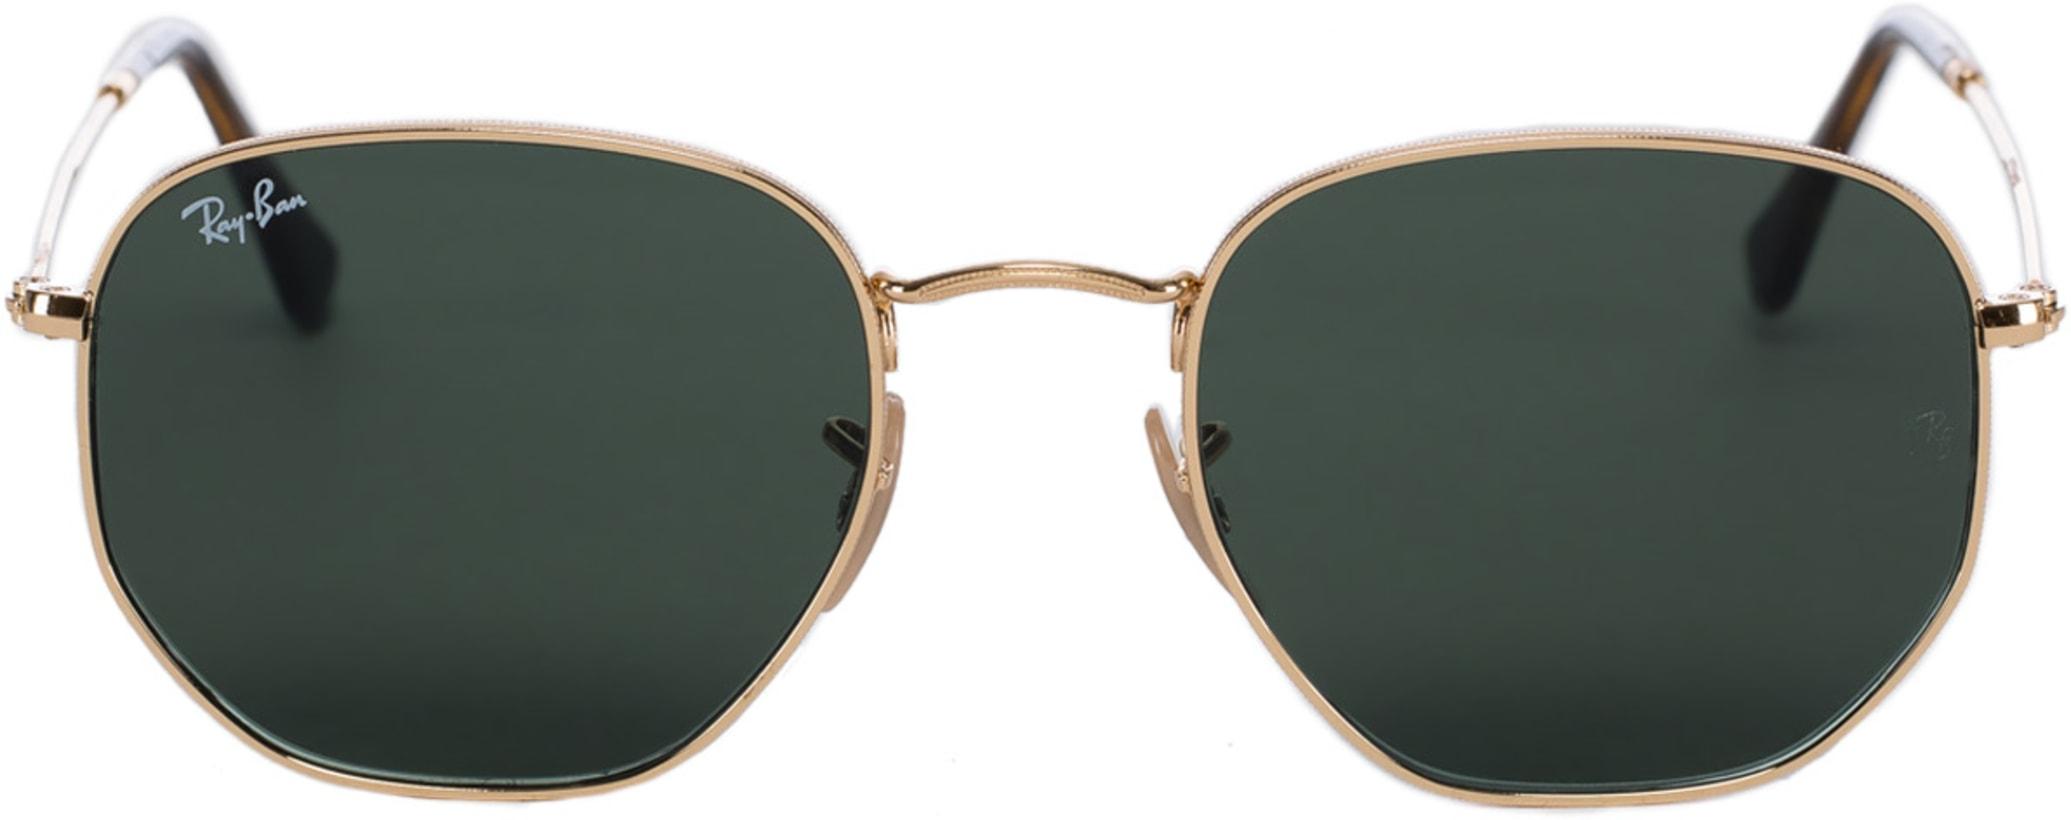 360a01db0e2bd Ray-Ban  Hexagonal Flat Lens Sunglasses - Gold Green Classic G-15 ...